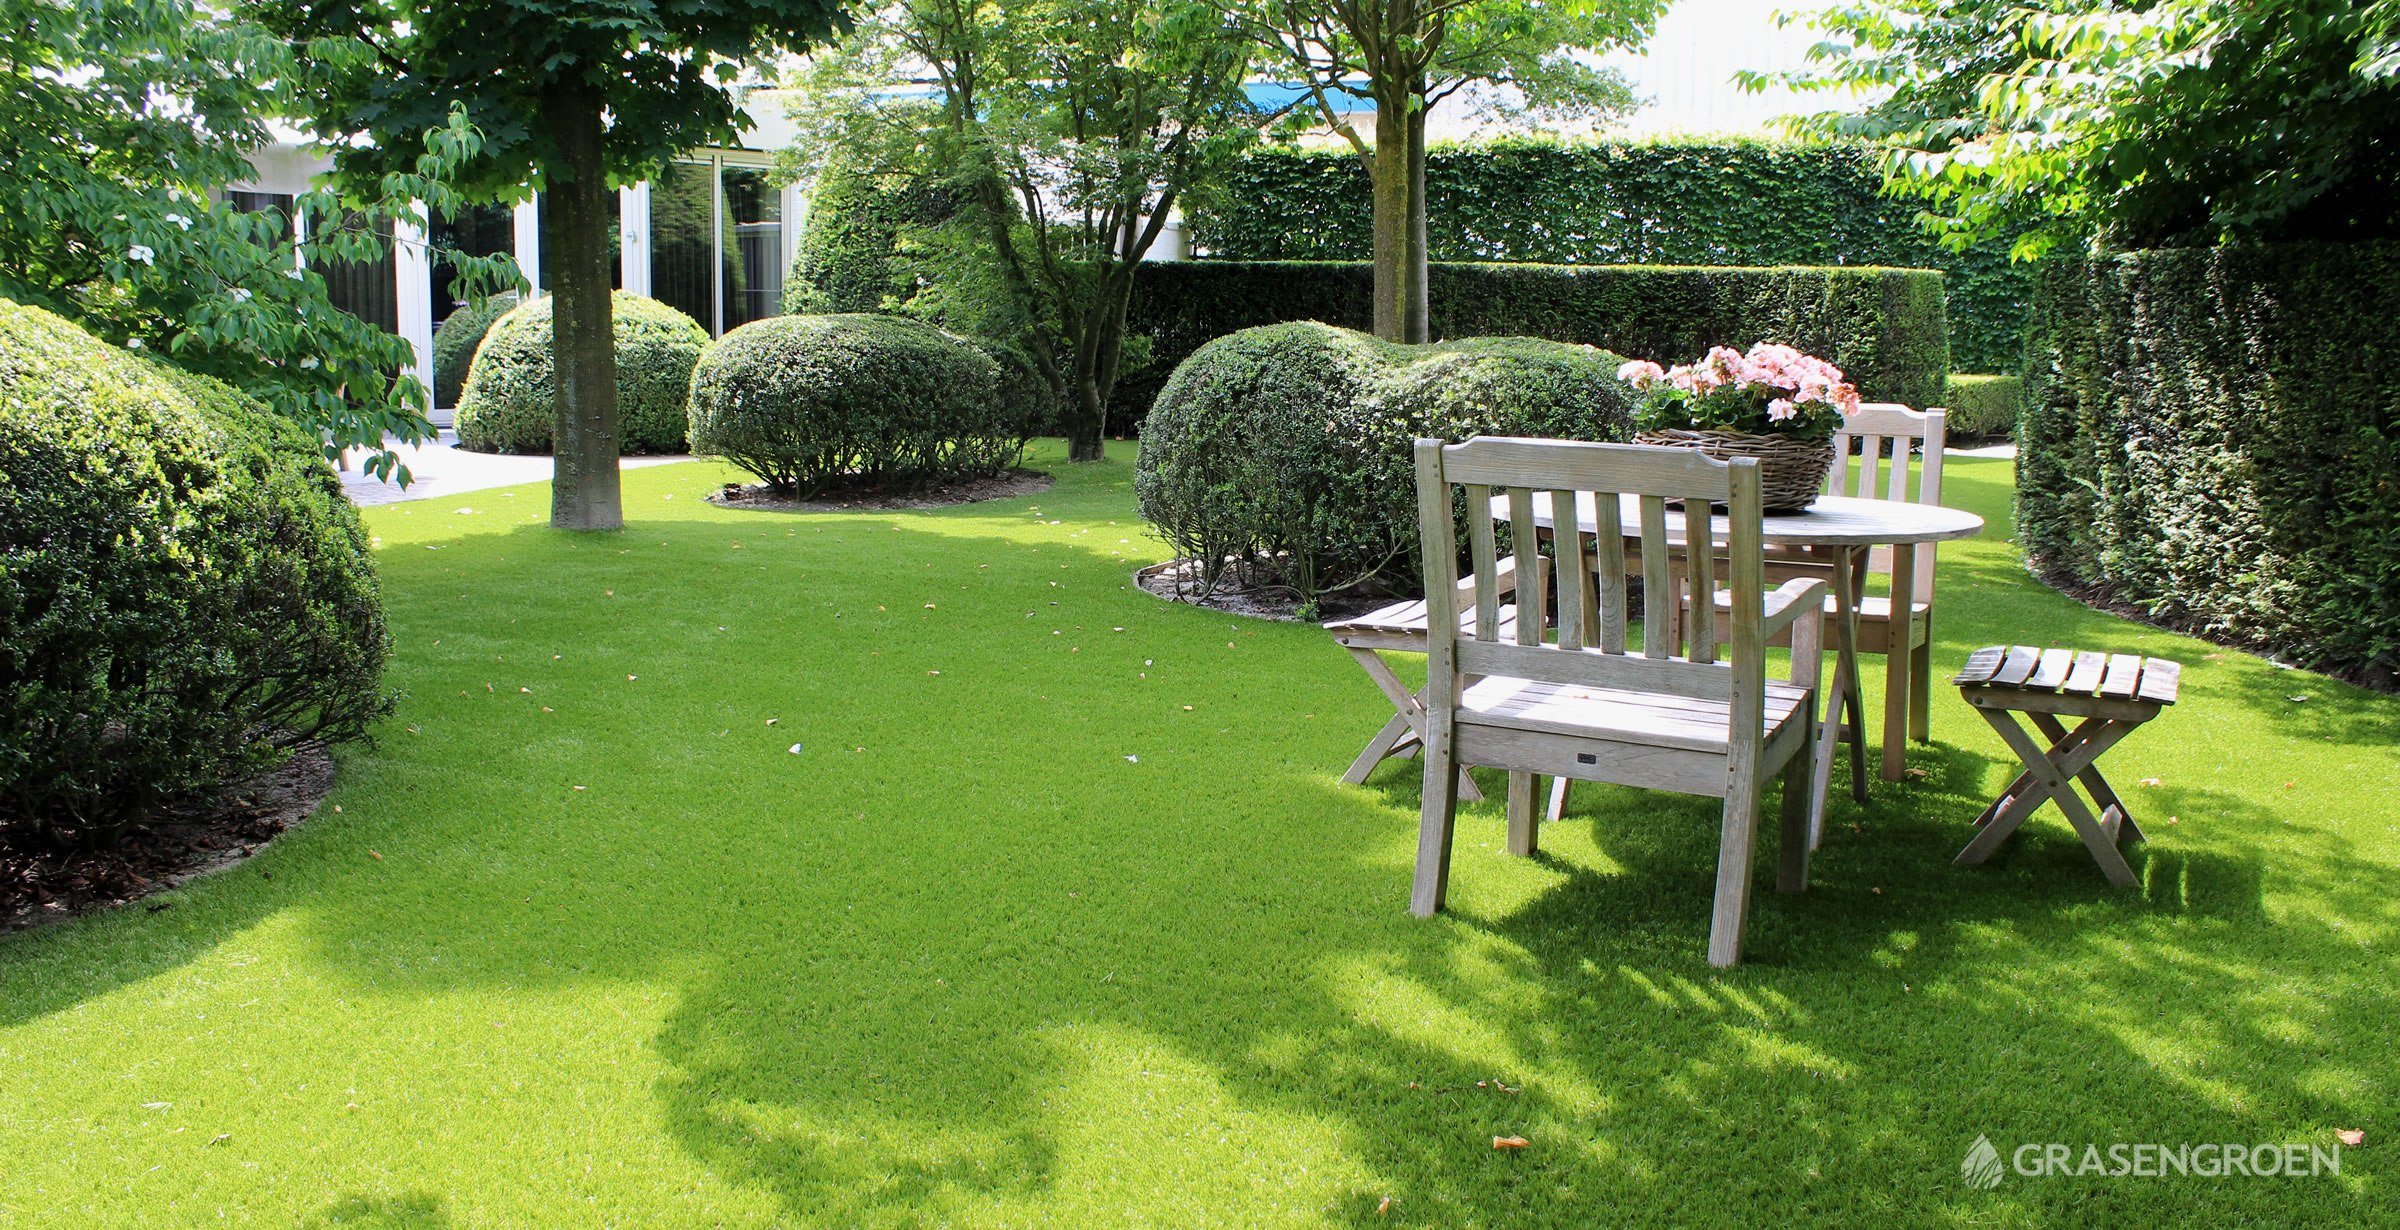 Kunstgrasleggenverlijmenslider5 • Gras en Groen Kunstgras